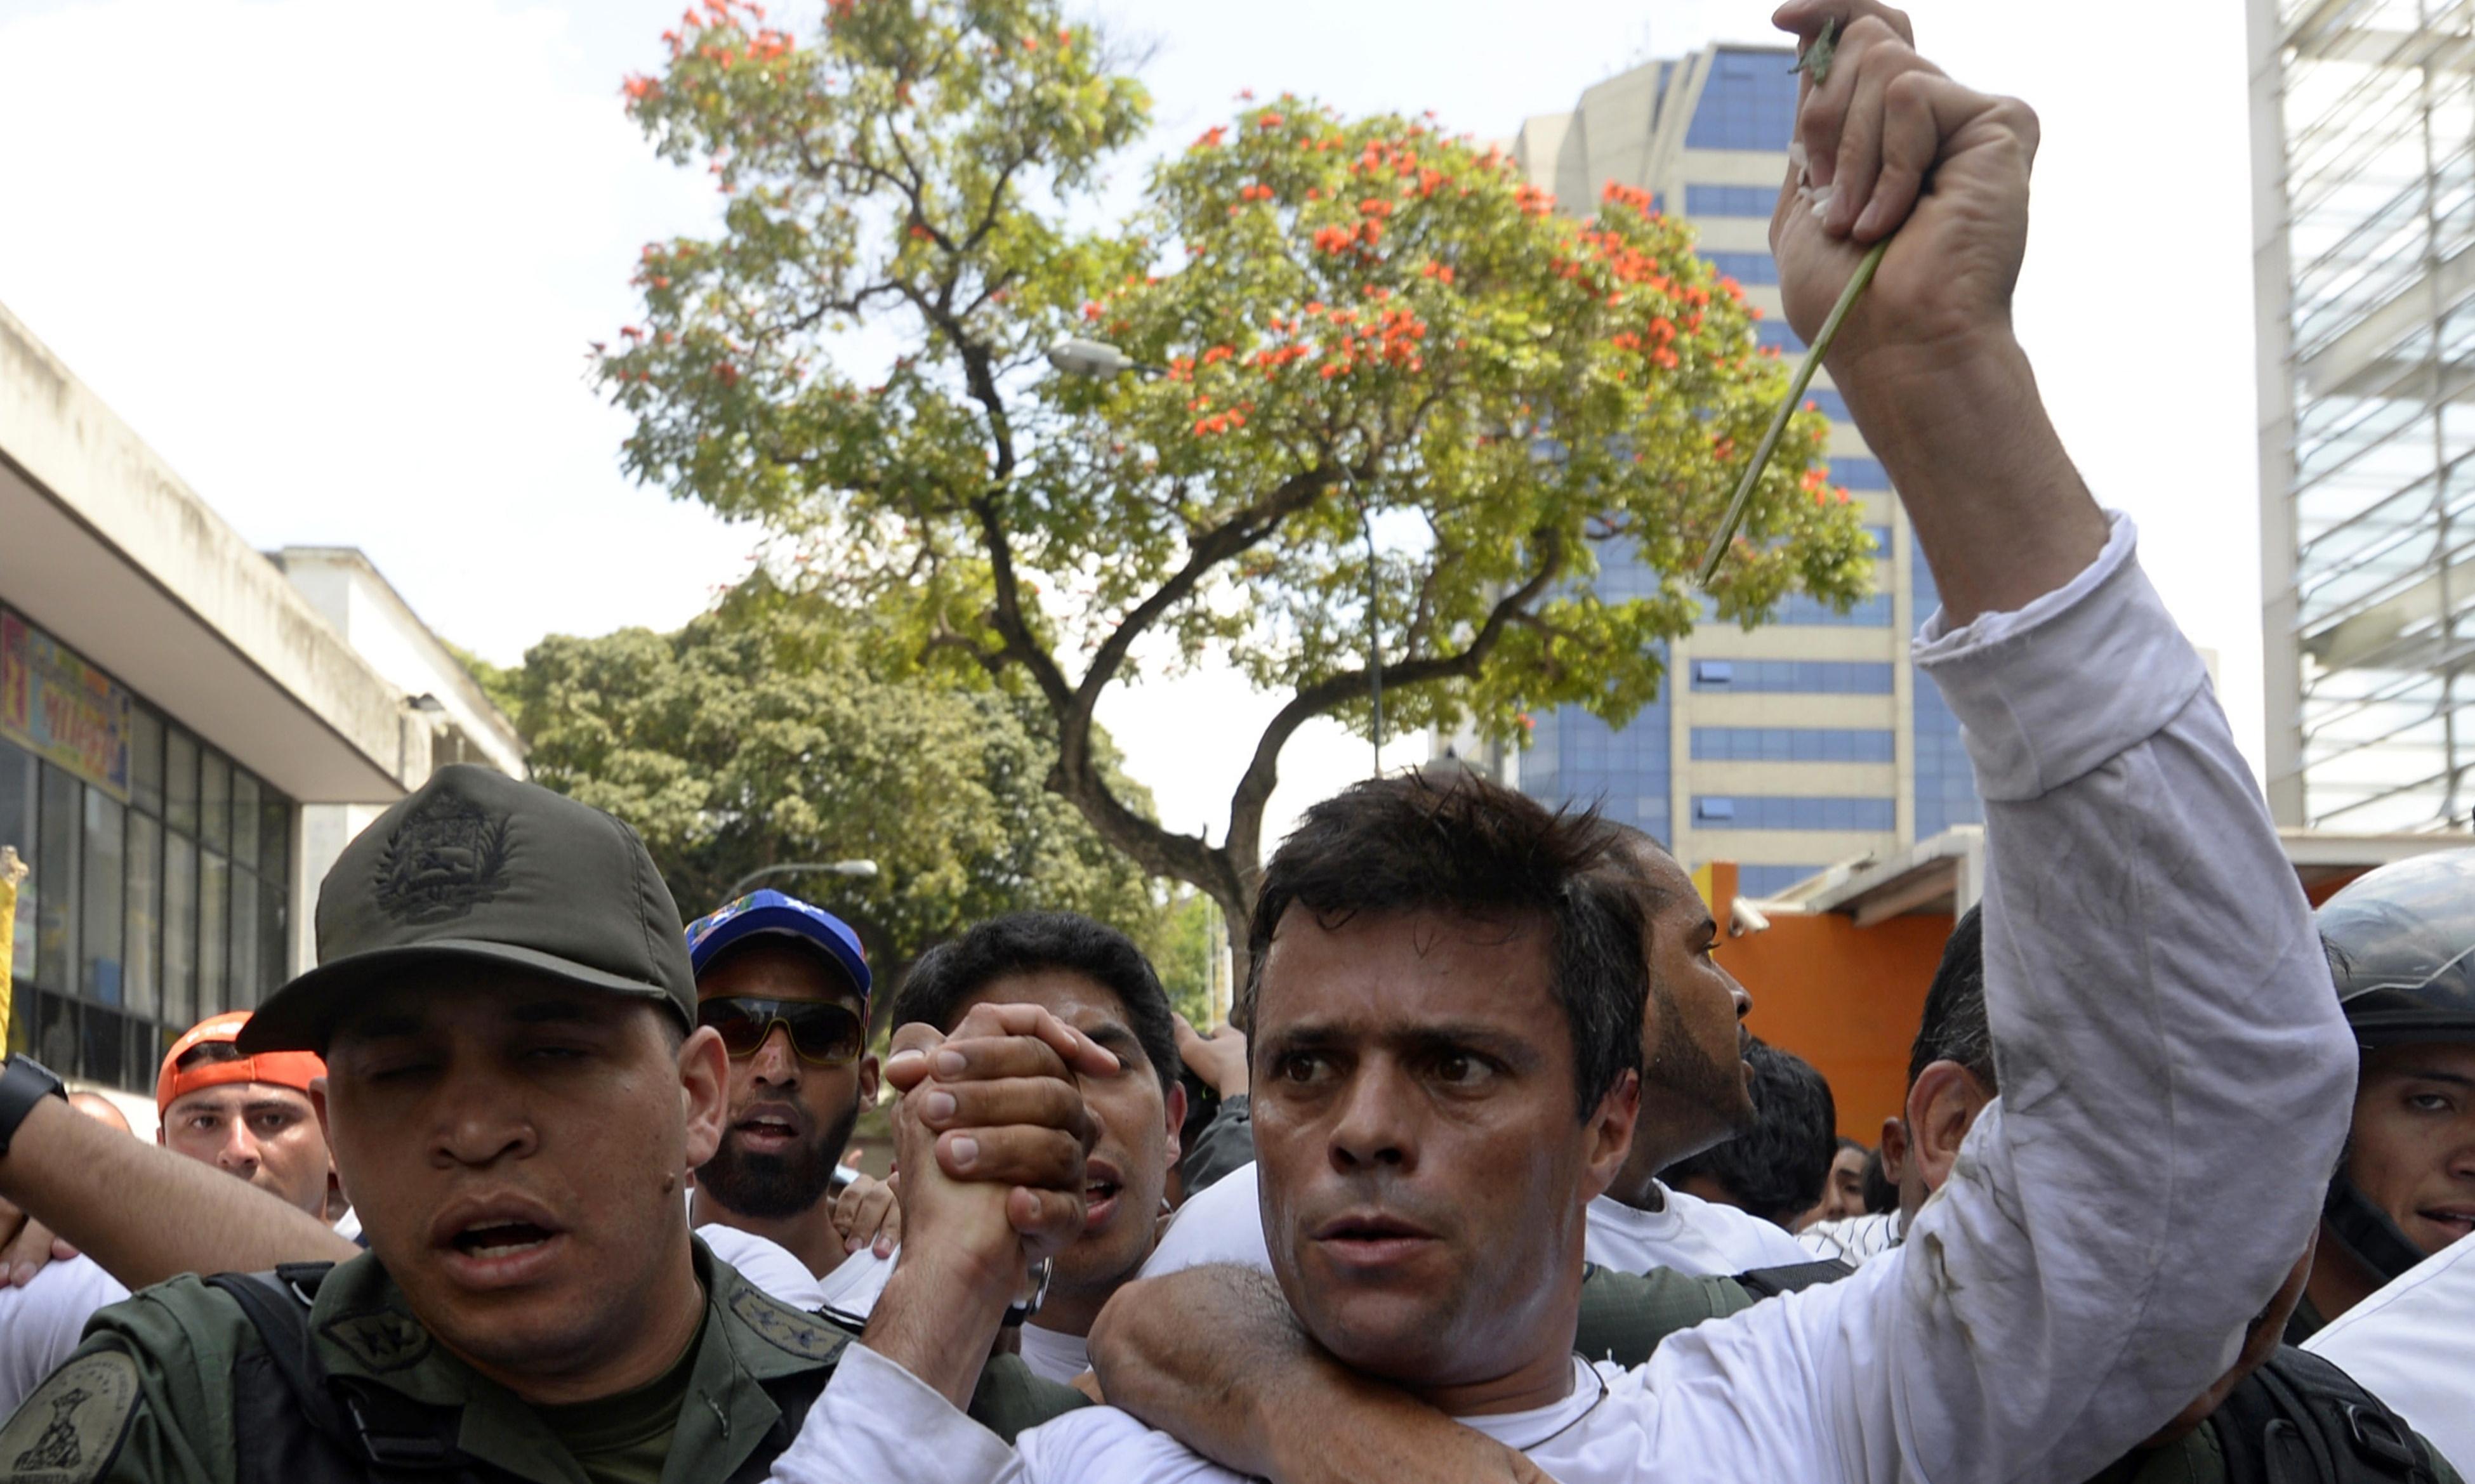 Leopoldo López: scion of Venezuelan elite dedicated to burying Chavismo